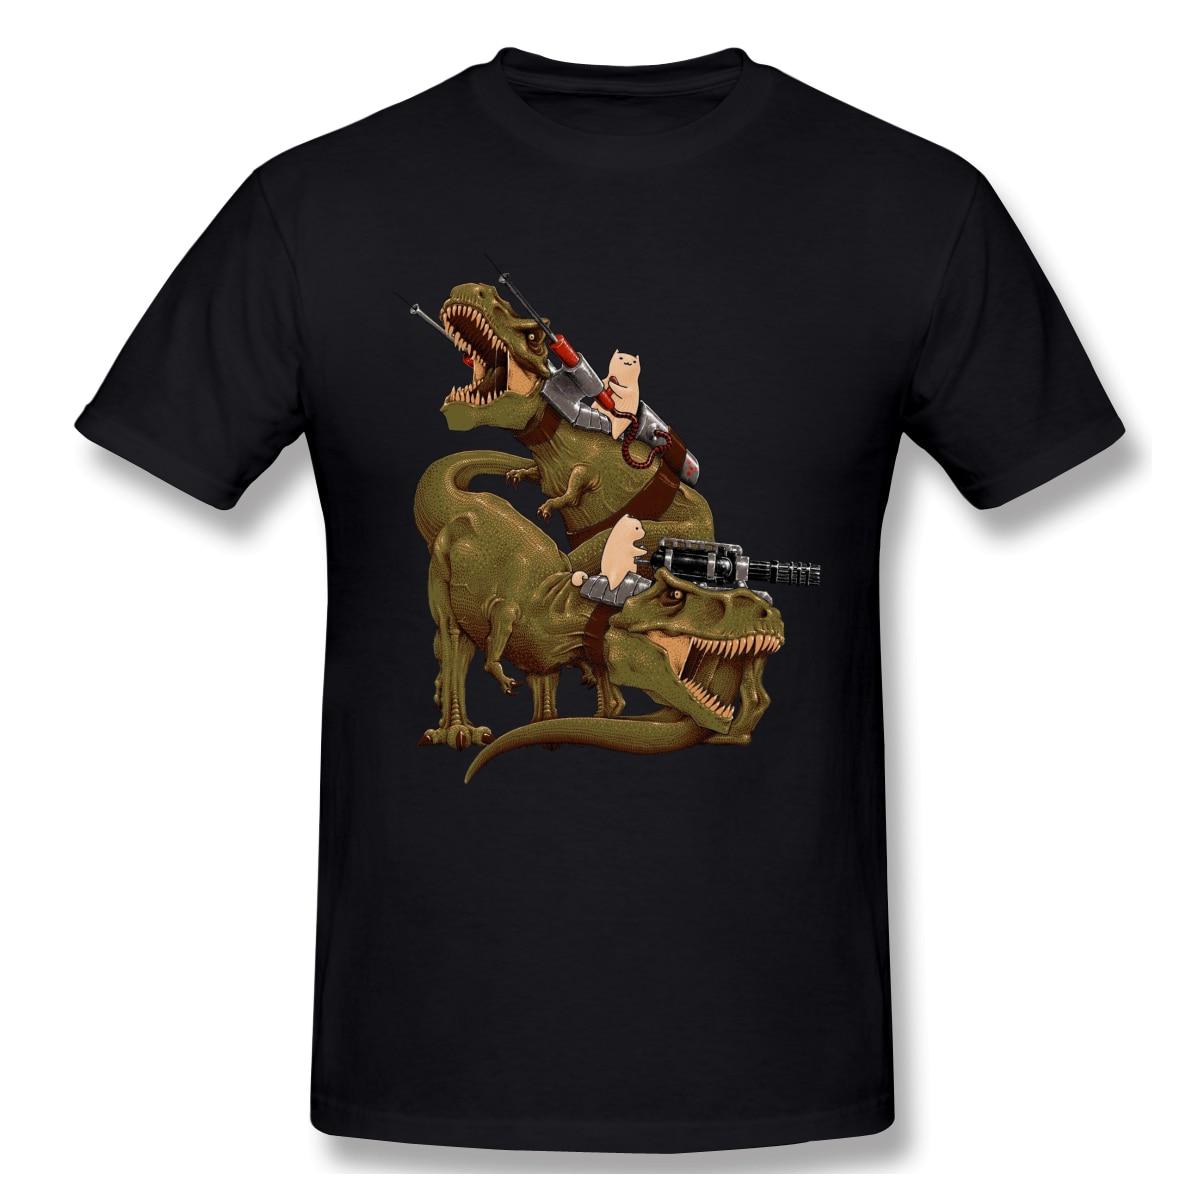 CATS RIDING T-REXS Print New Summer Cotton Funny T Shirts Short sleeves T-shirt Men Fashion Streetwear Tide brand